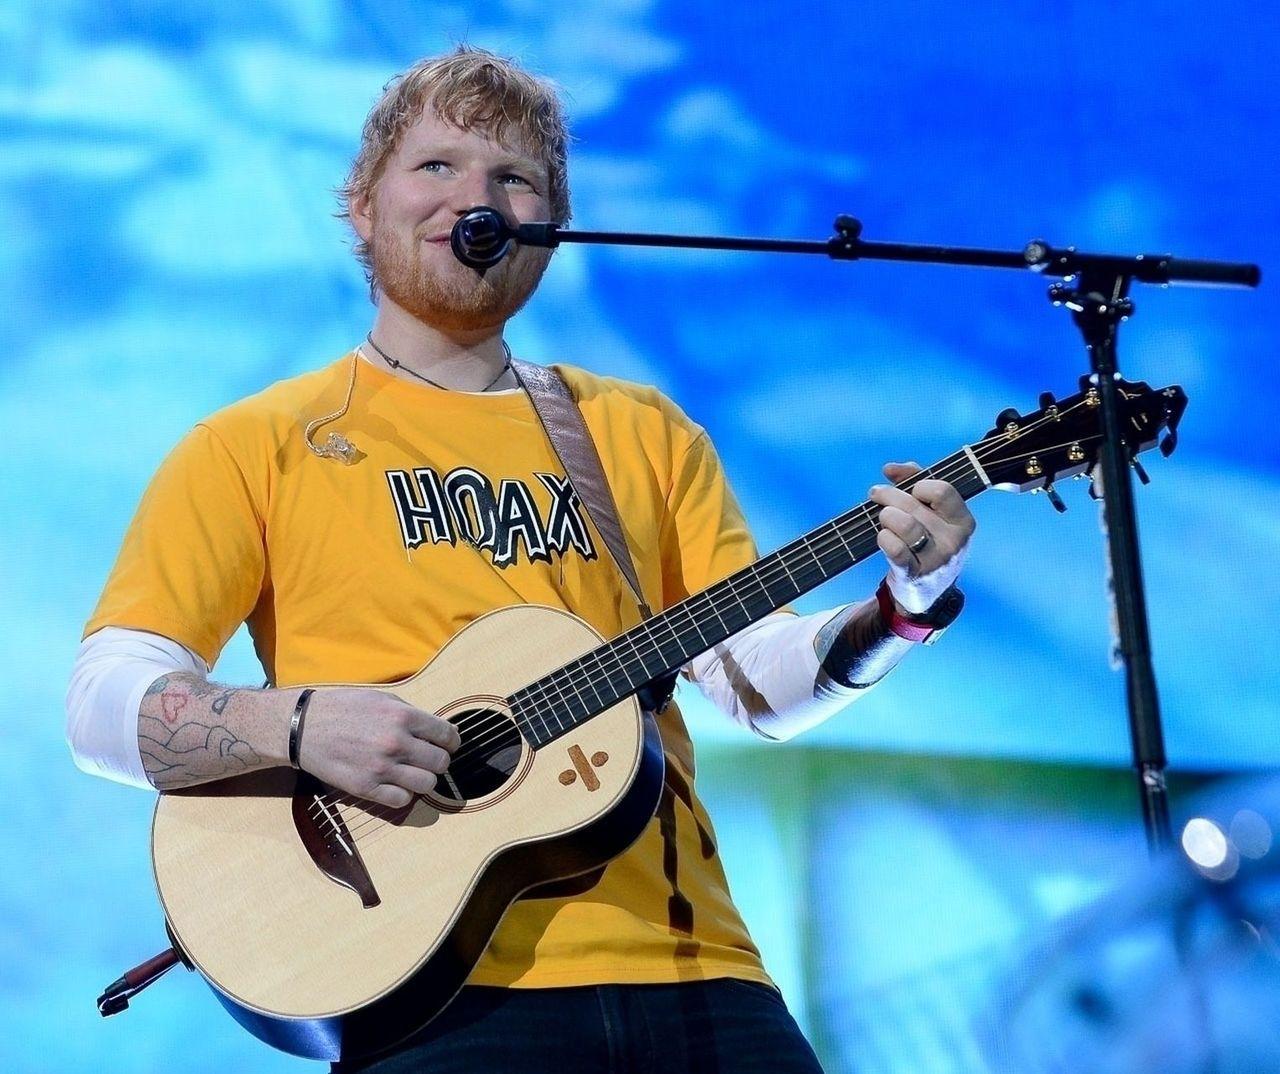 Ed Sheeran performs during his Divide Tour 2019 at Allianz Parque in Sao Paulo Ed Sheeran